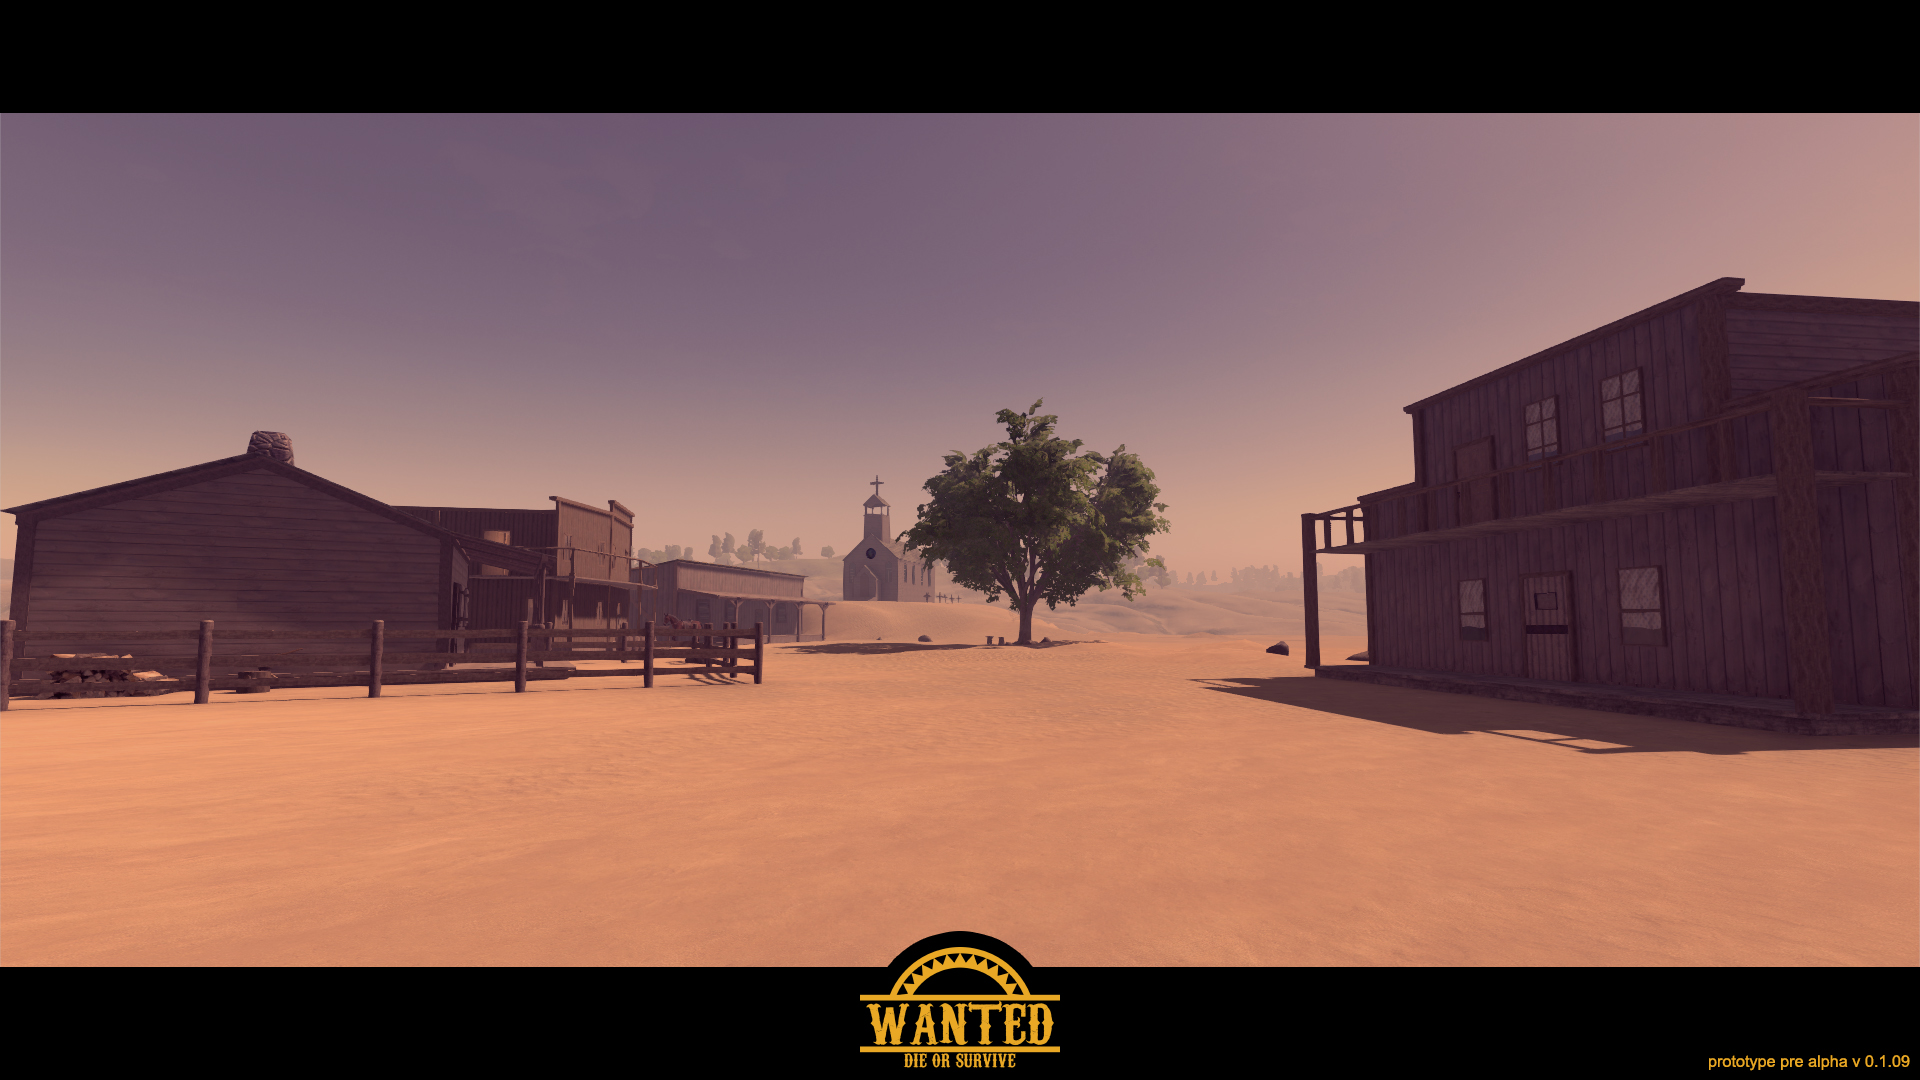 Prototype screenshot